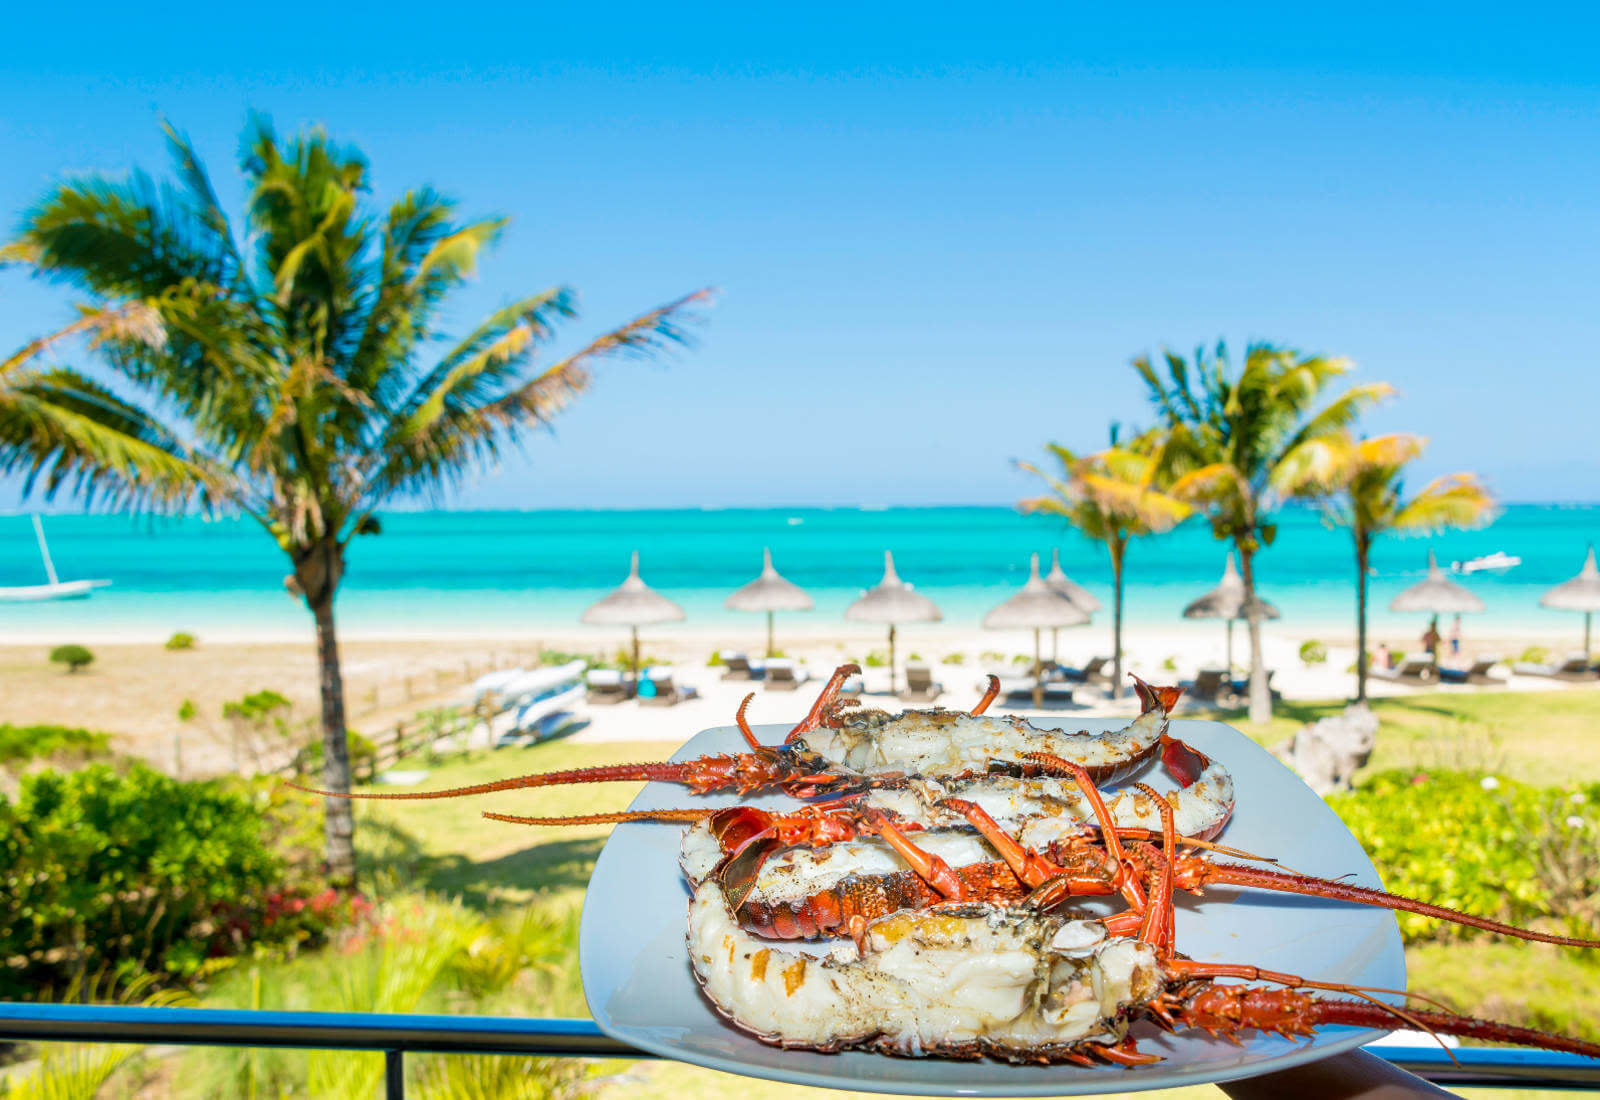 Glutenfreie Hotels weltweit - glutenfreien Urlaub bei weg.de ...